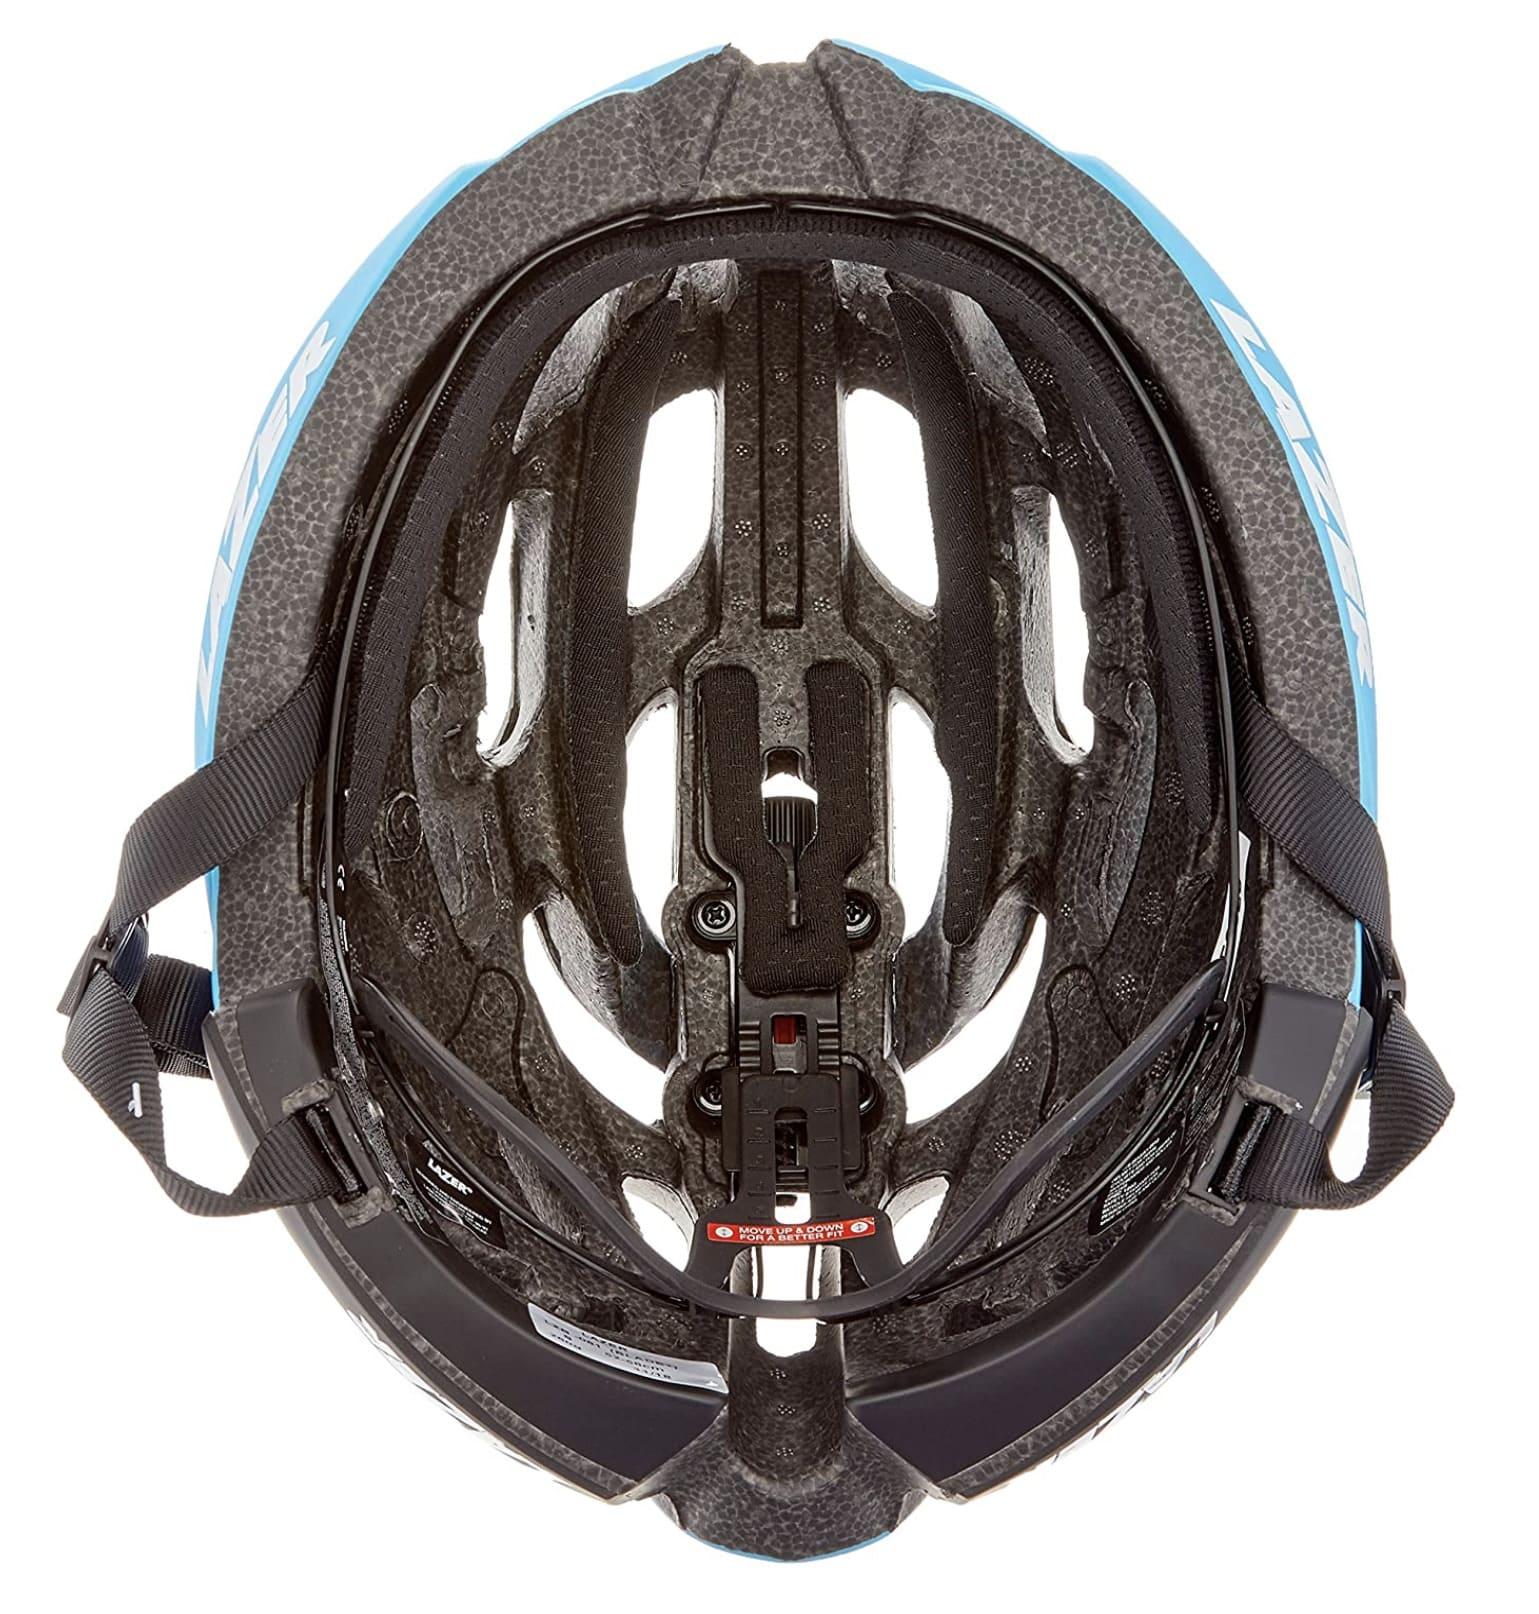 autoajuste interno del casco de bicicleta para niños Lazer Pnut